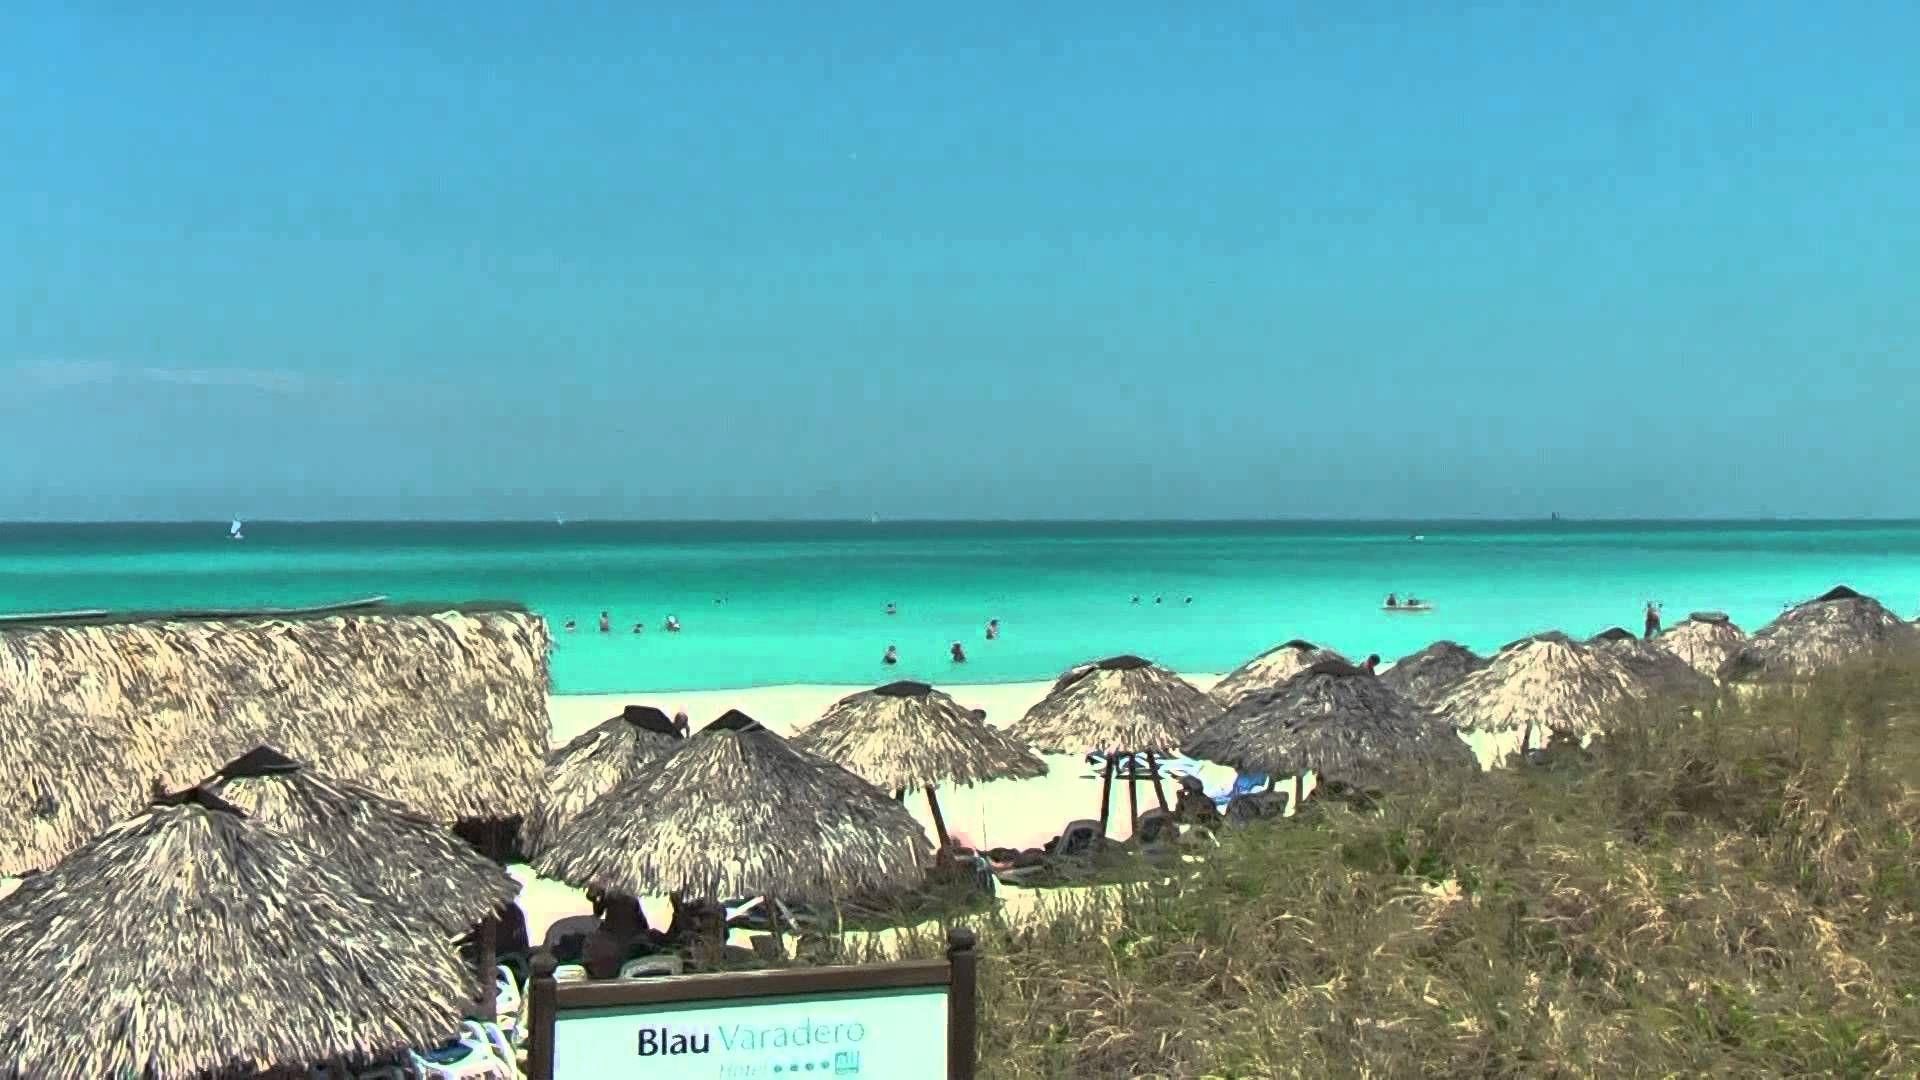 Hotel Blau Varadero Is A Very Luxury Hotel With A Wonderful Beach In Varadero Cuba Varadero Beach Beautiful Beaches